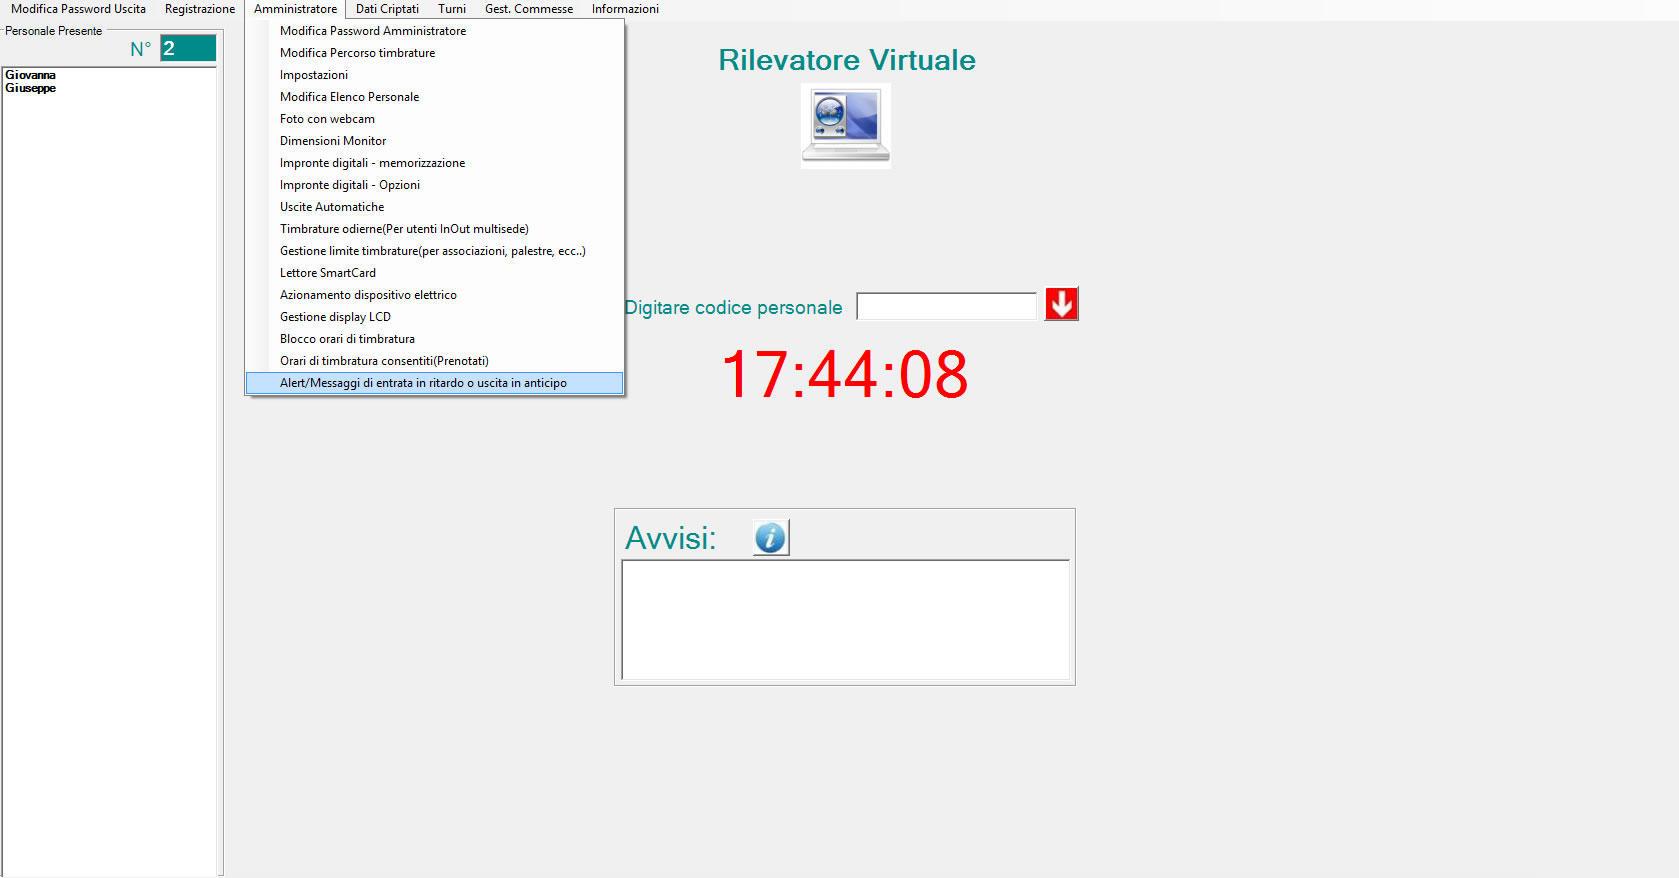 Gestione_orari_entrate_ritardo_uscite_anticipo_menu